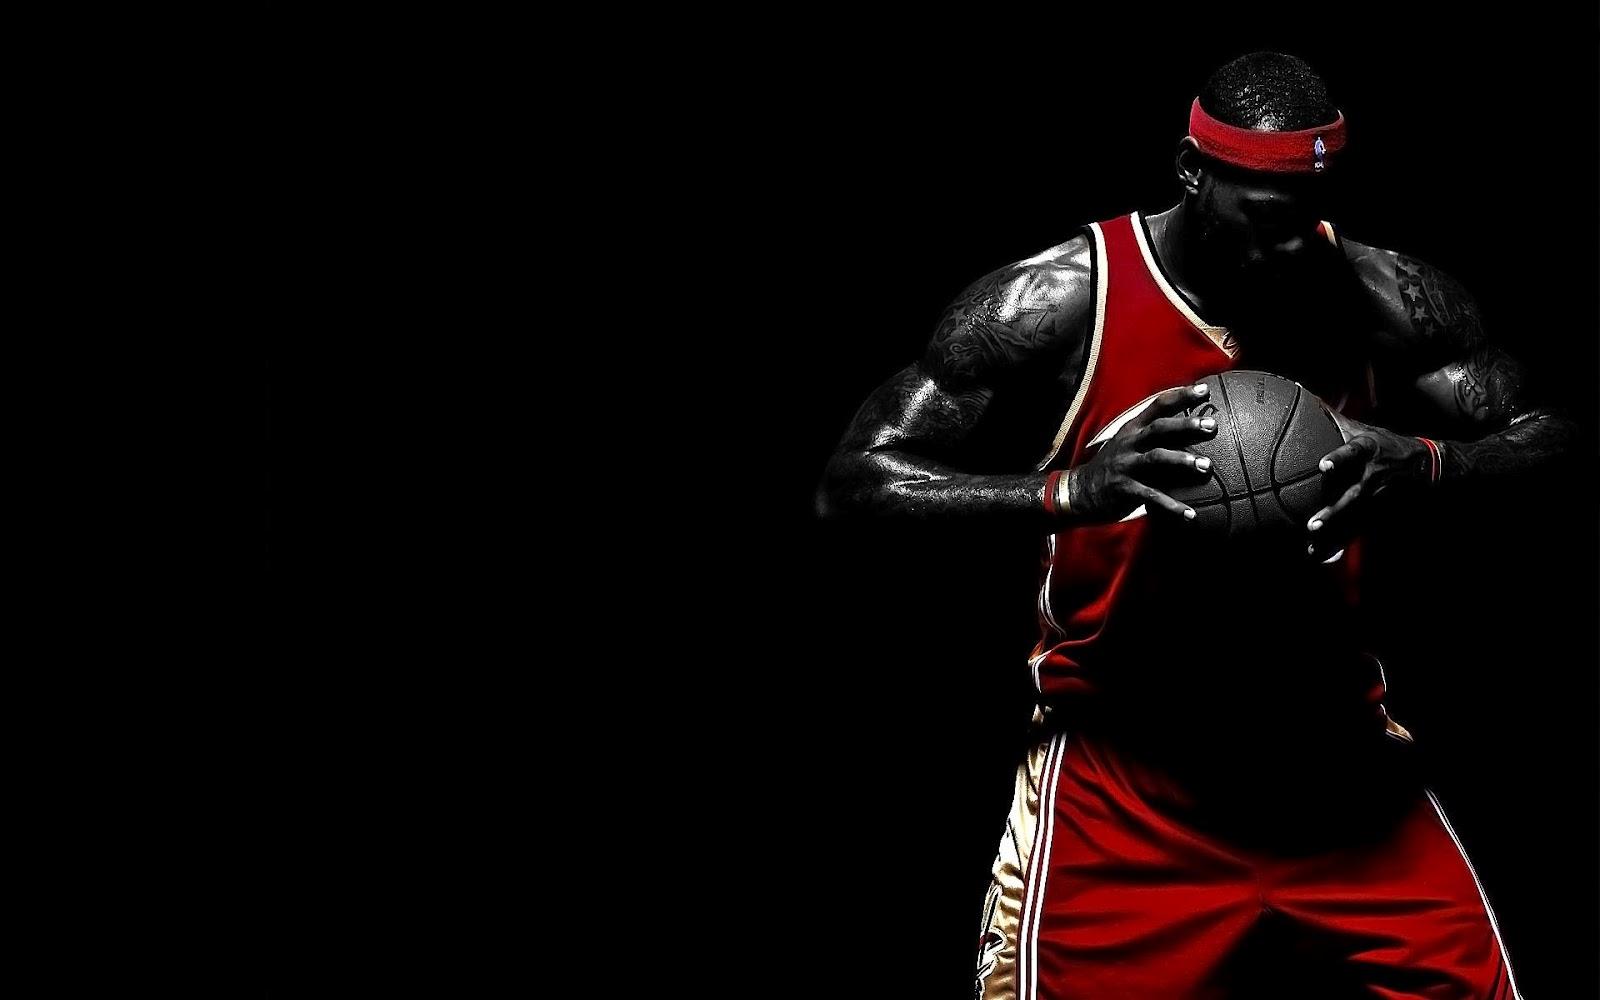 3d basketball wallpapers for desktop - photo #10